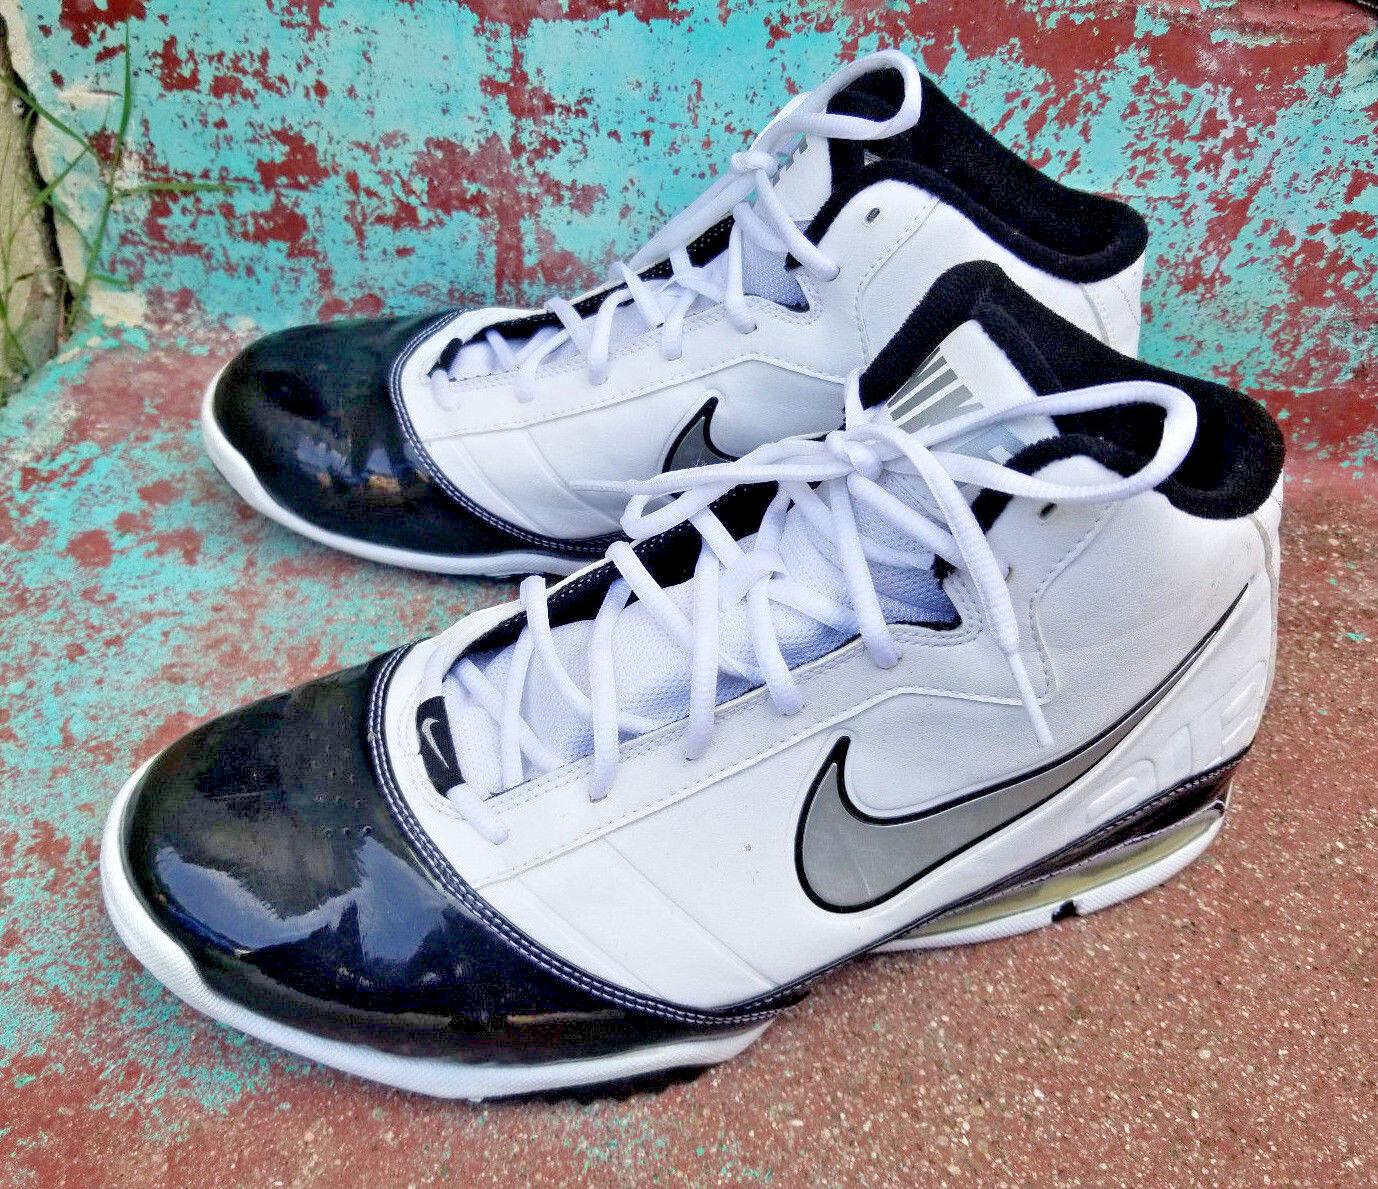 Nike Air Max Turnaround Men's Basketball Shoes Size White Black 386237-101